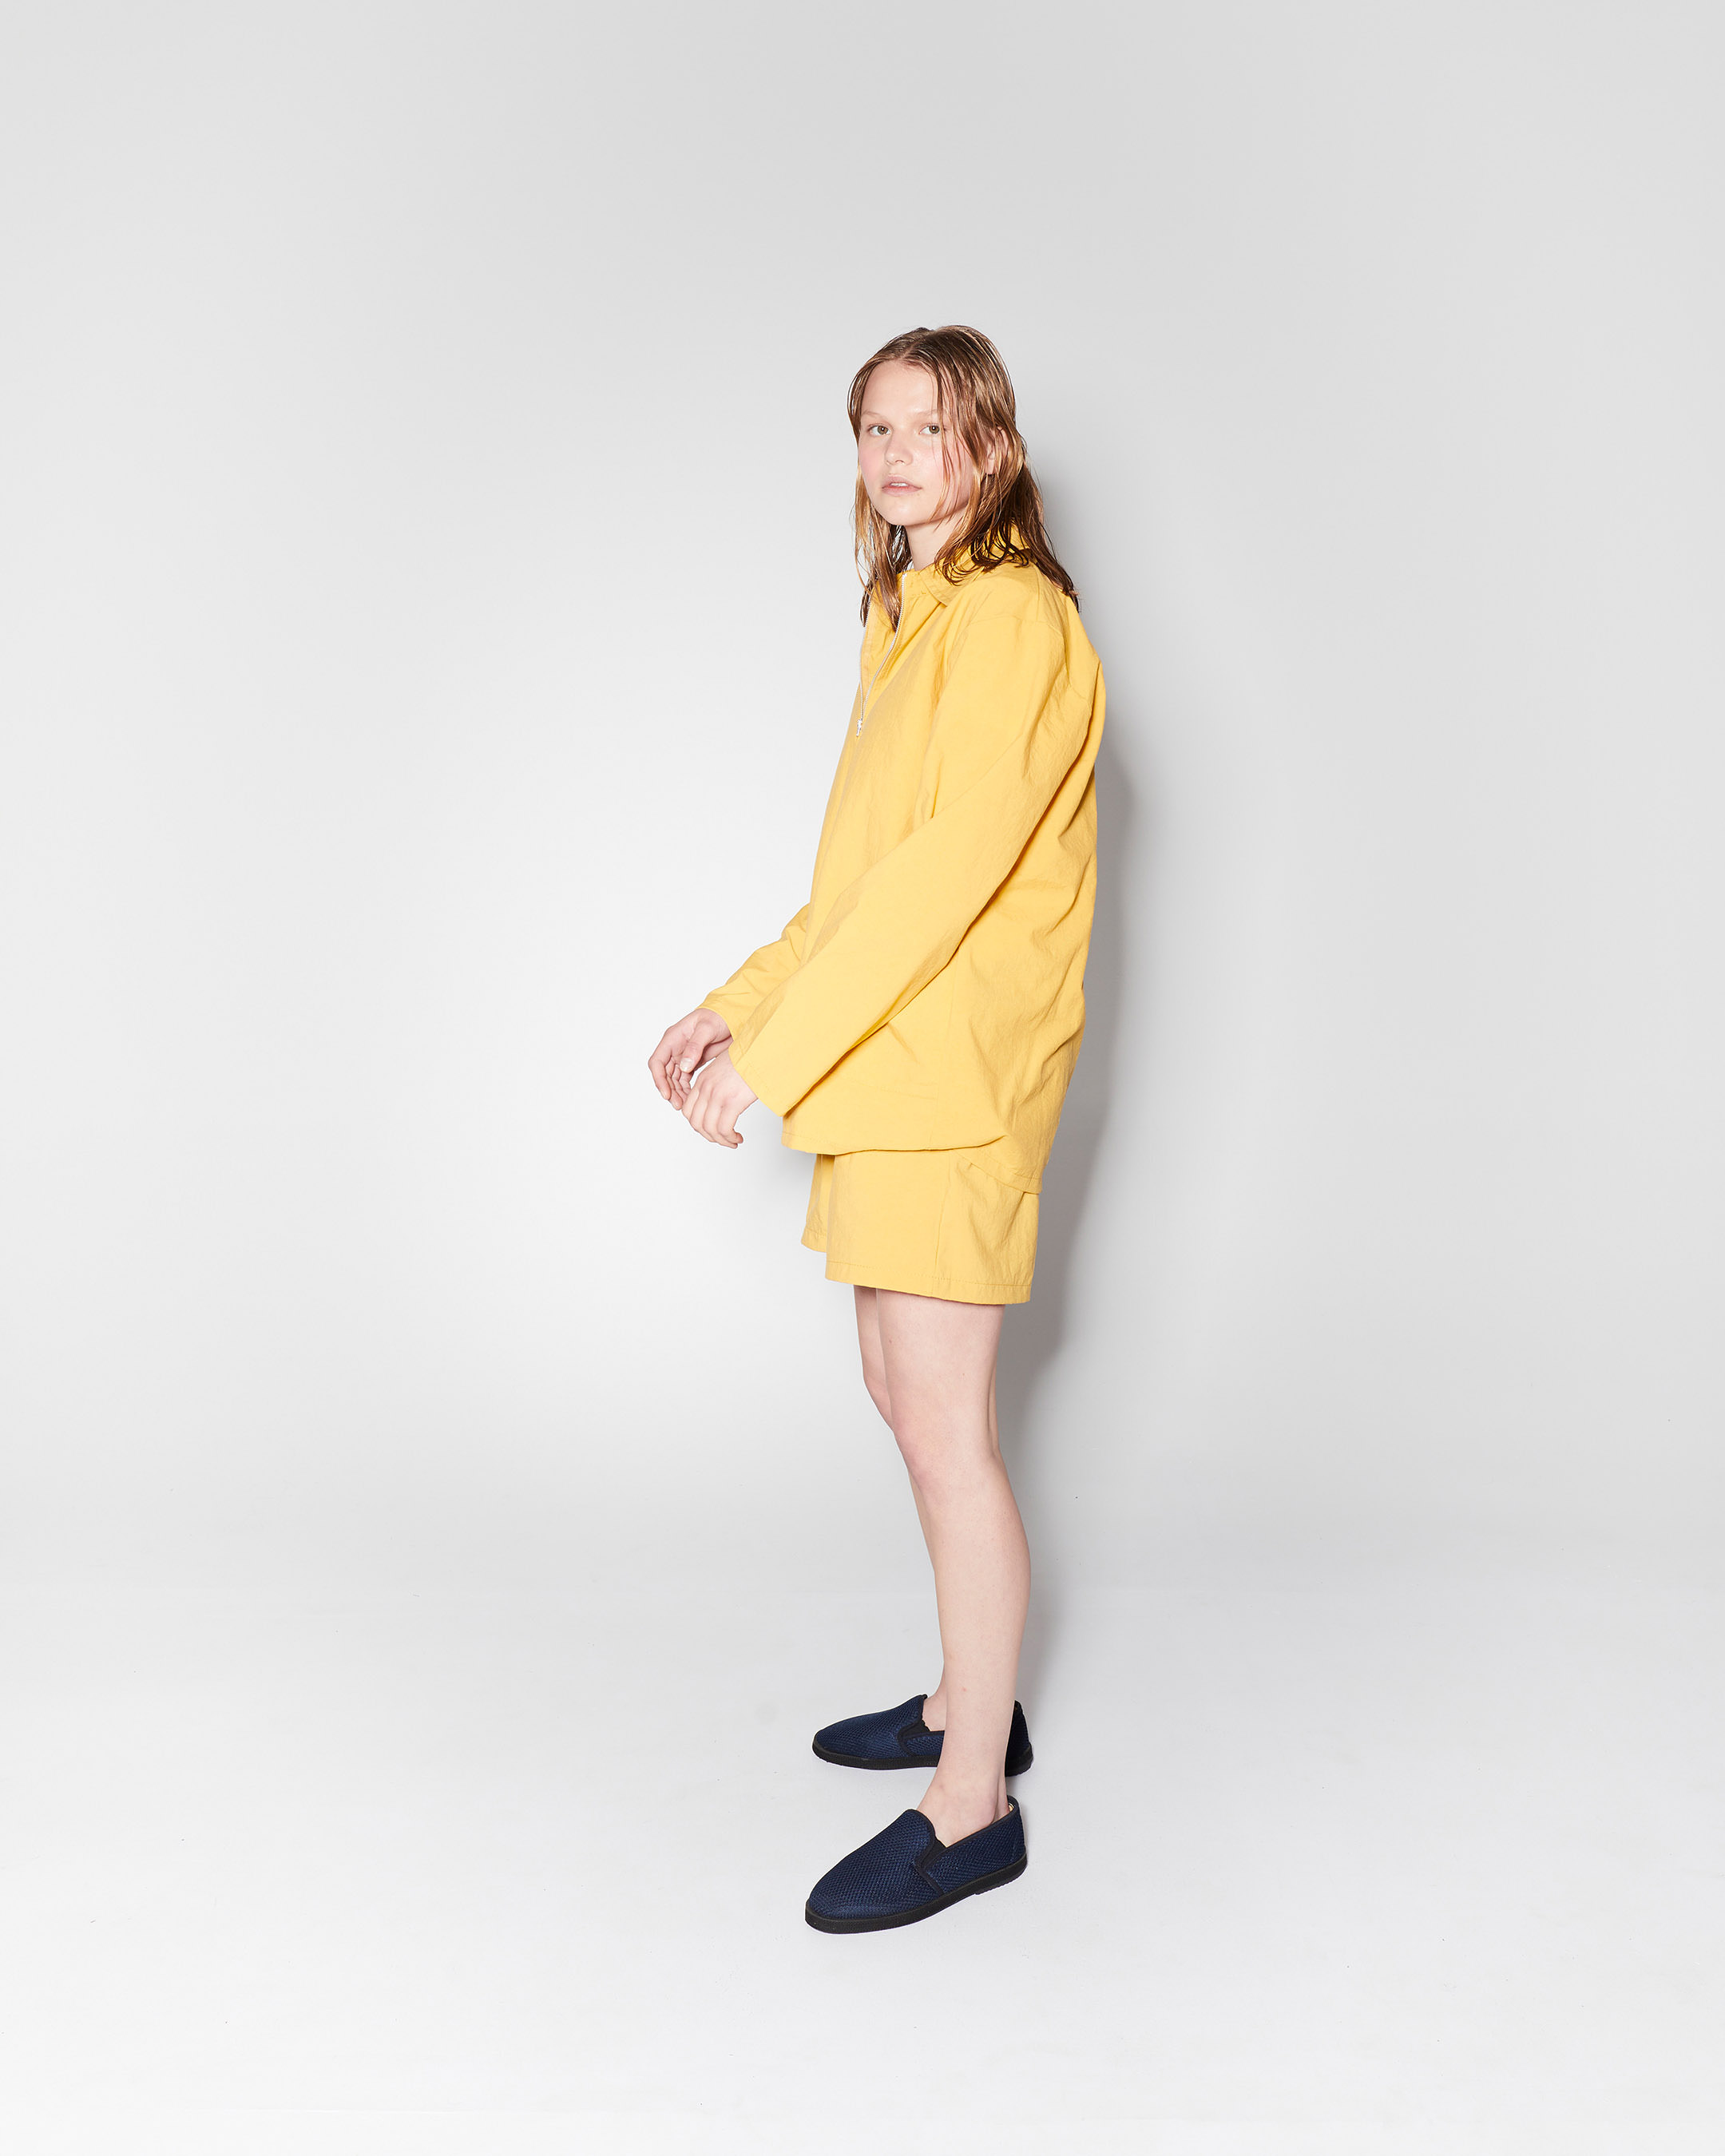 shirts 3  nylon tracksuit yellow 210415 ecom 1185